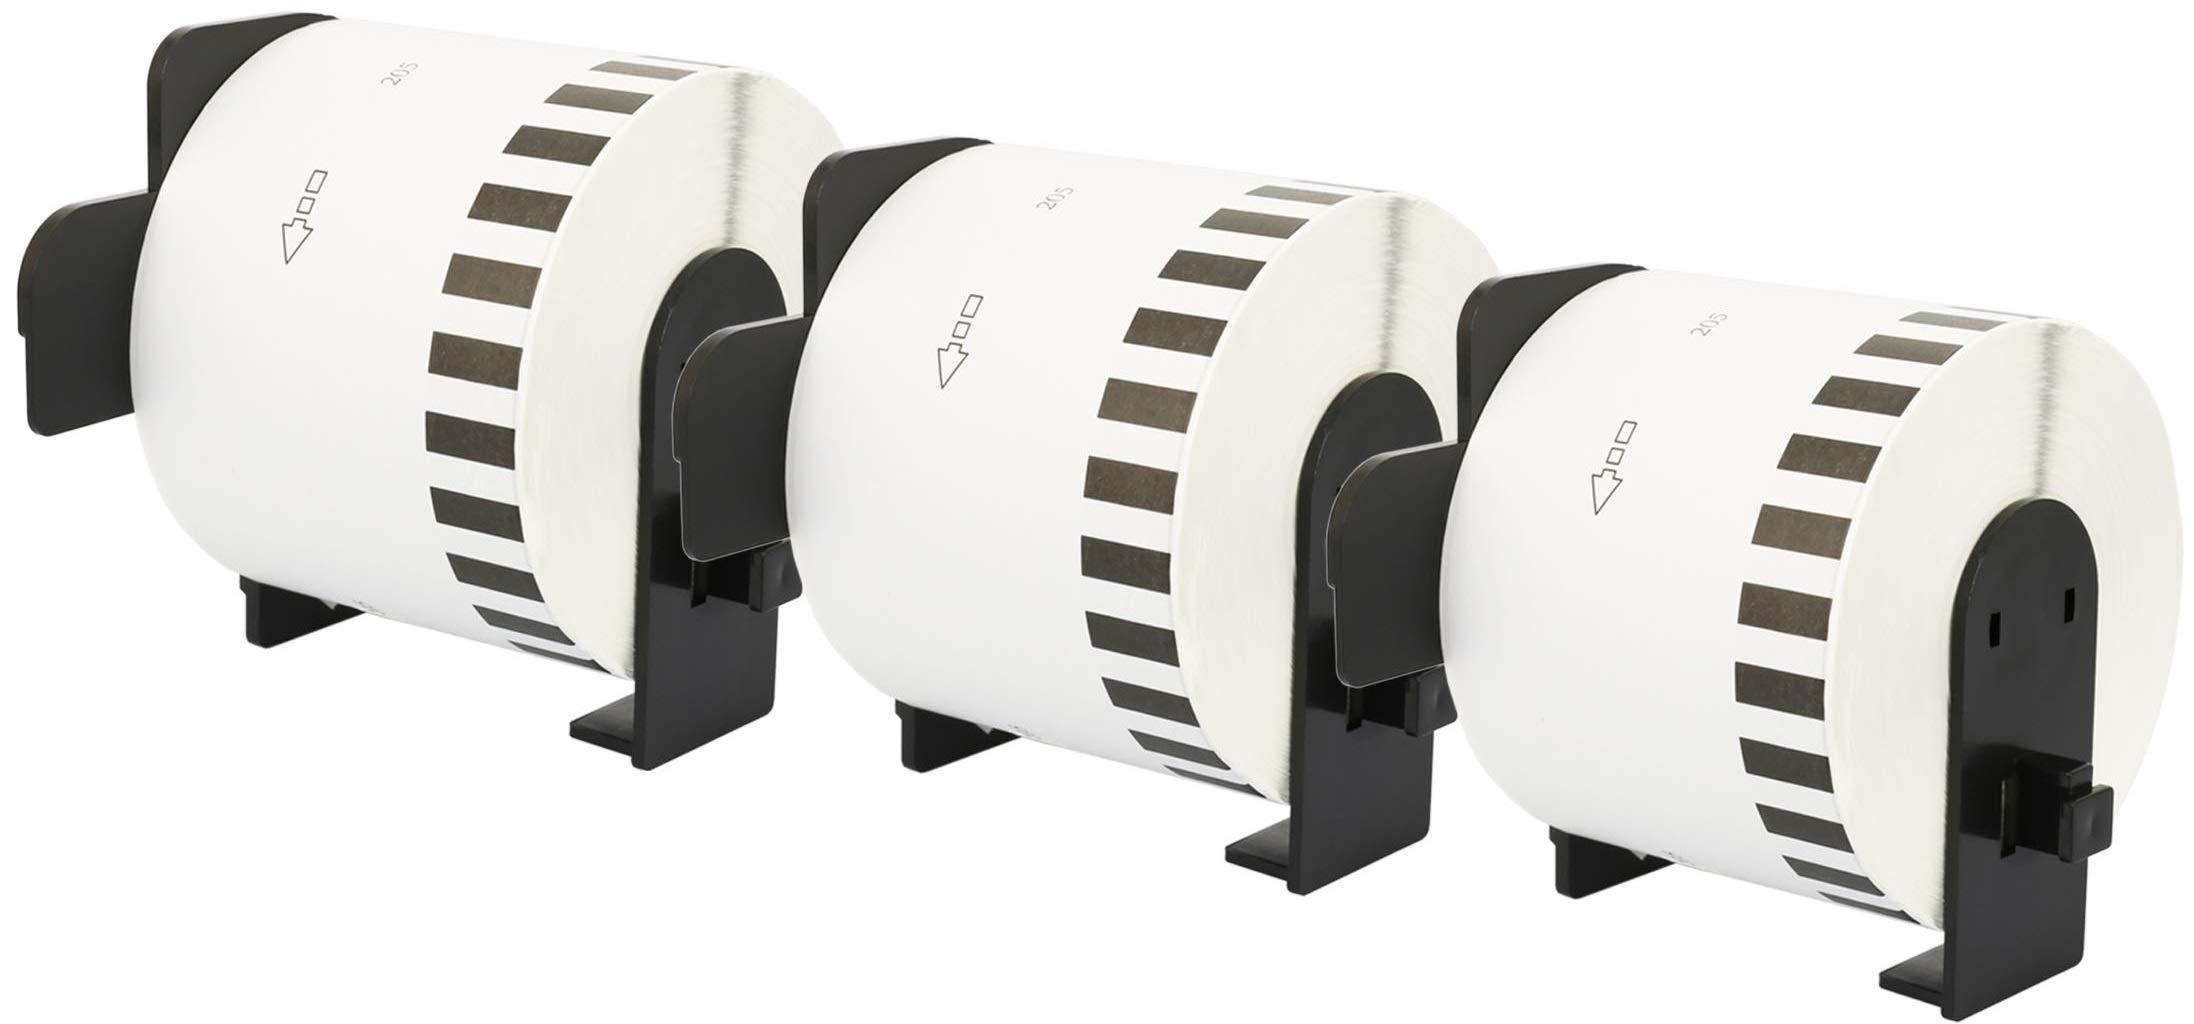 3X DK-44205 62 mm x 30.48 m Cintas de Etiquetas continuas Removibles compatibles para